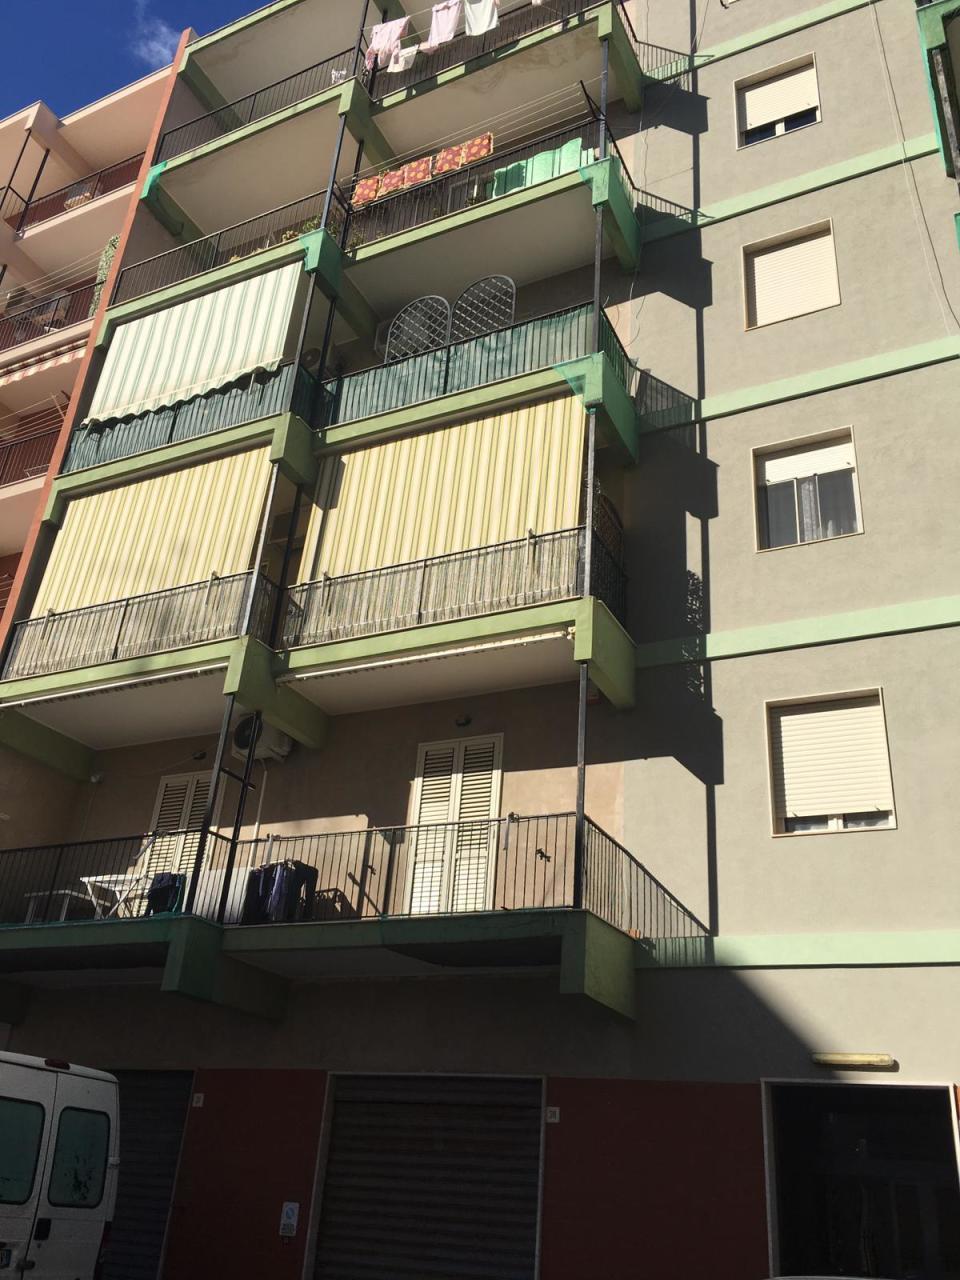 Appartamento - Trilocale a Tunisi Grottasanta Servi di Maria, Siracusa